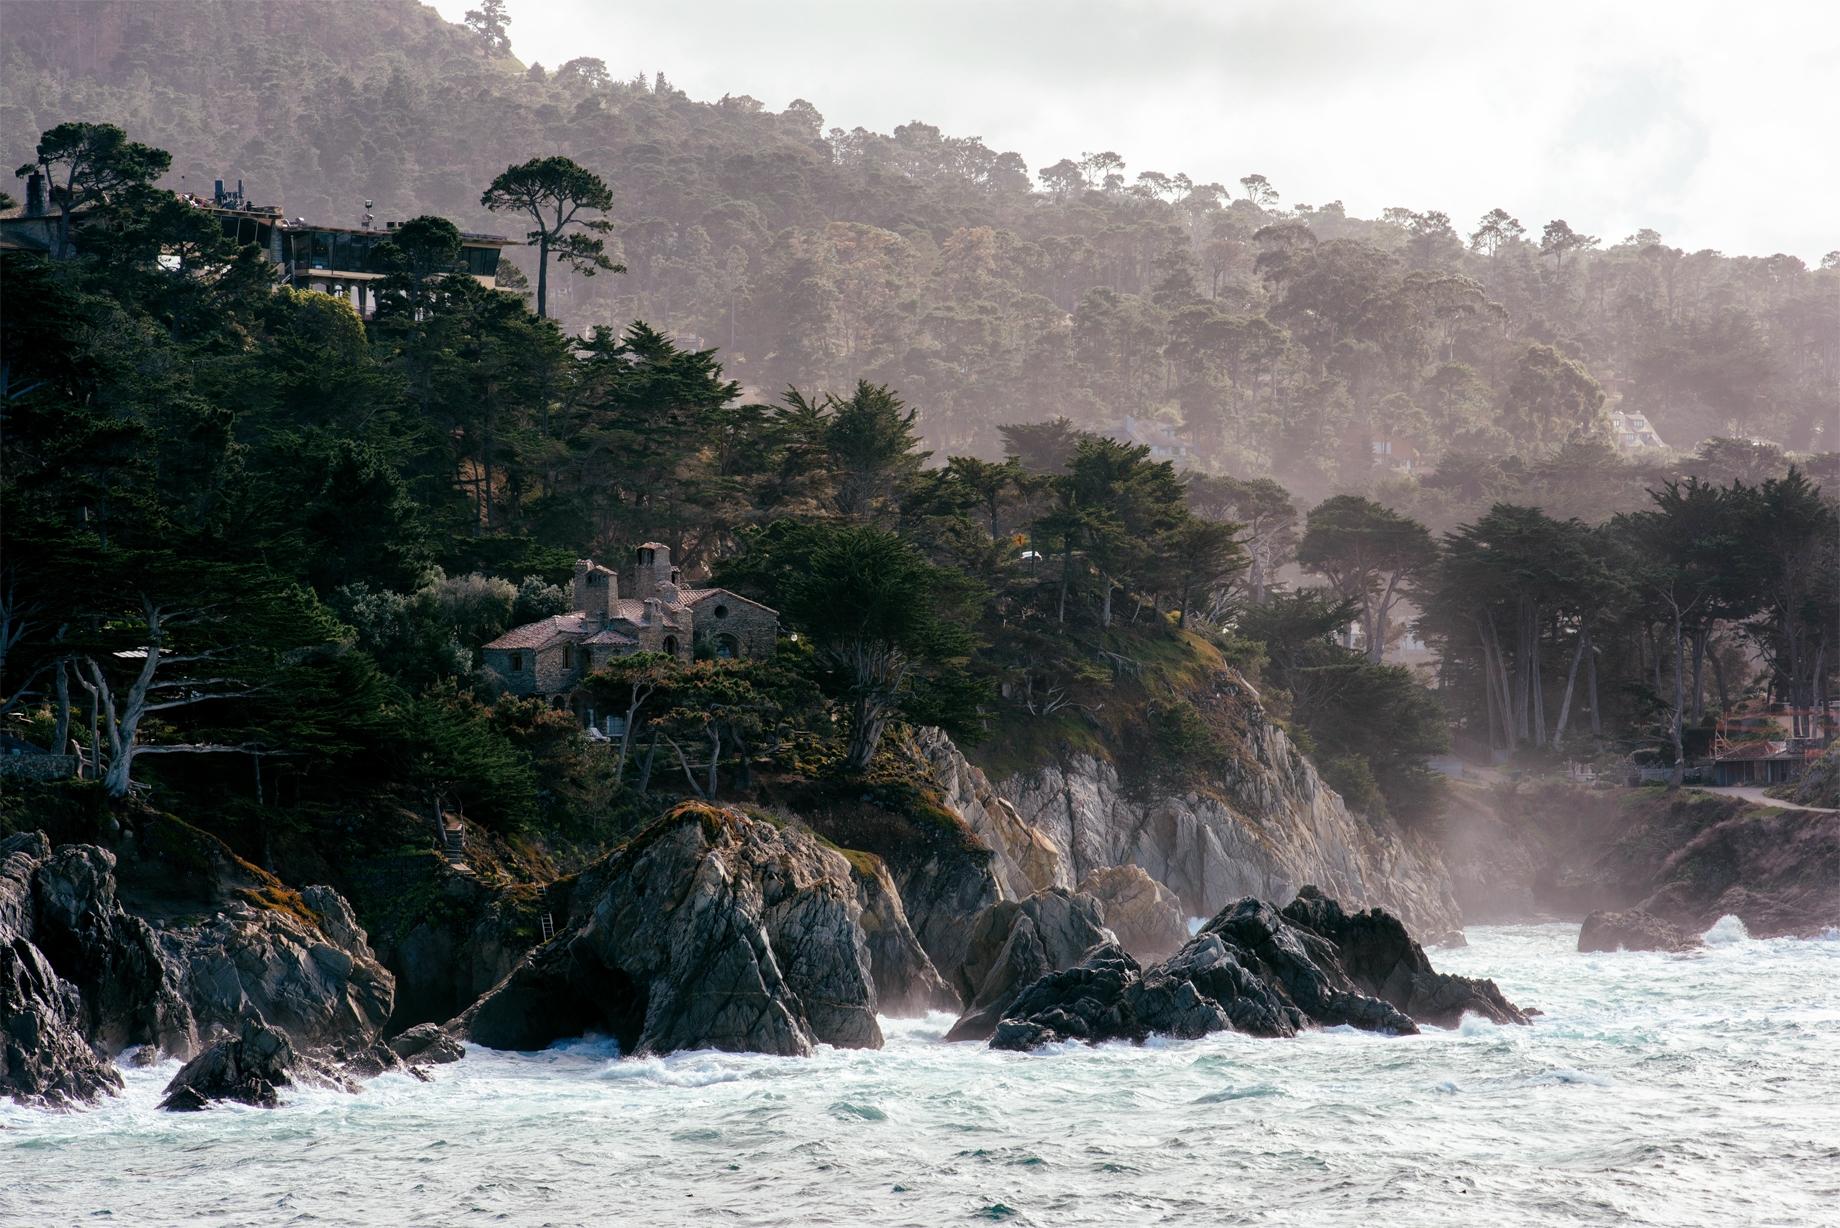 Carmel Highlands Point Lobos CA - neonicecream | ello